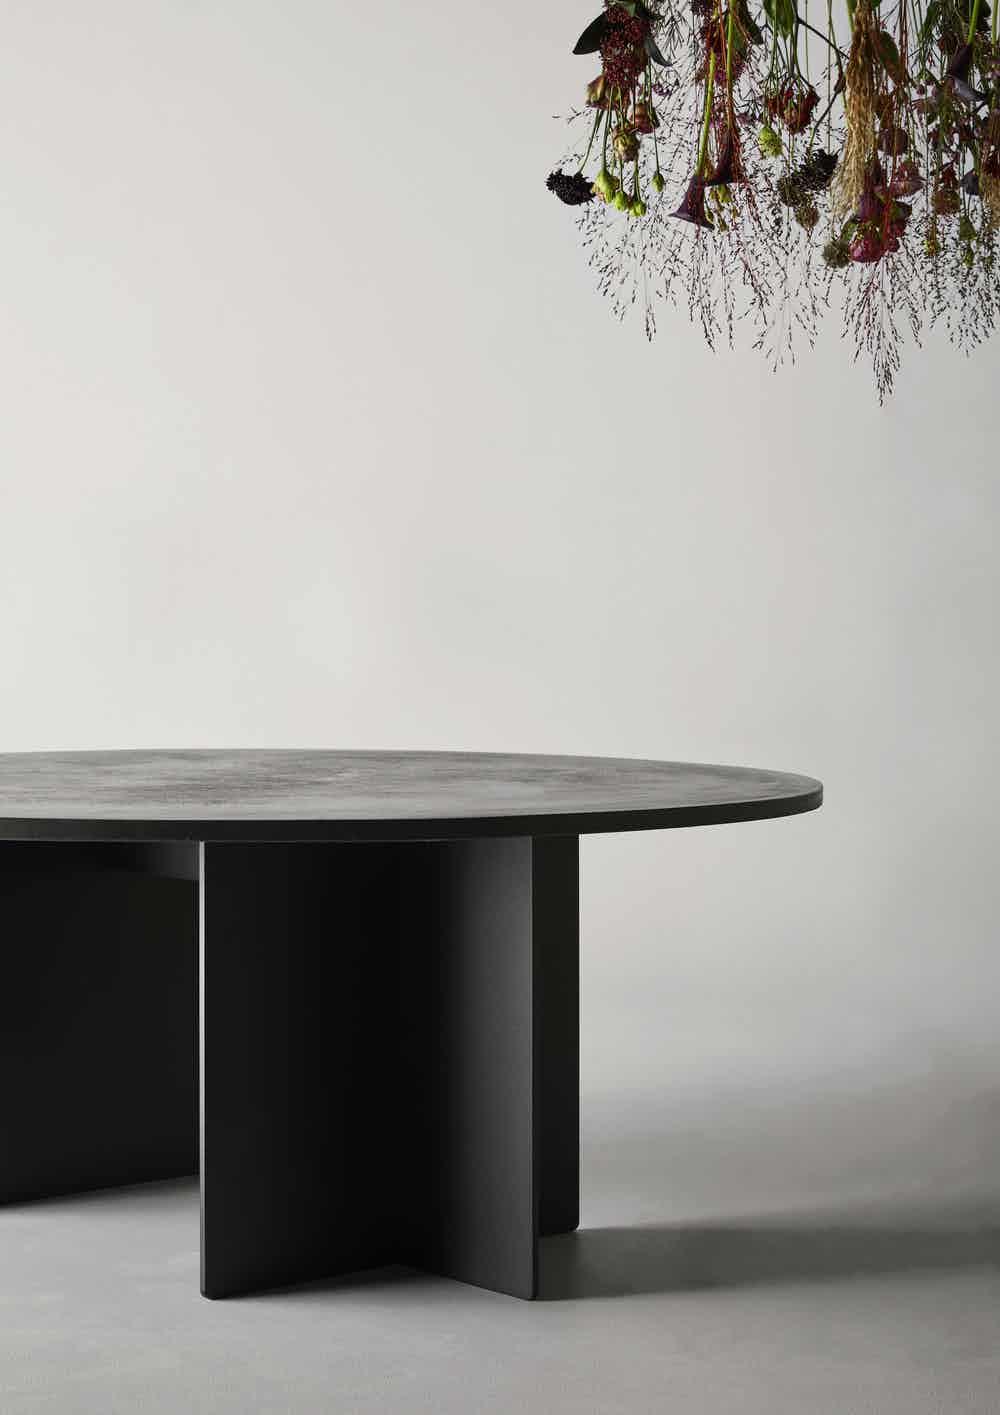 Eberhart furniture ivo table detail haute living